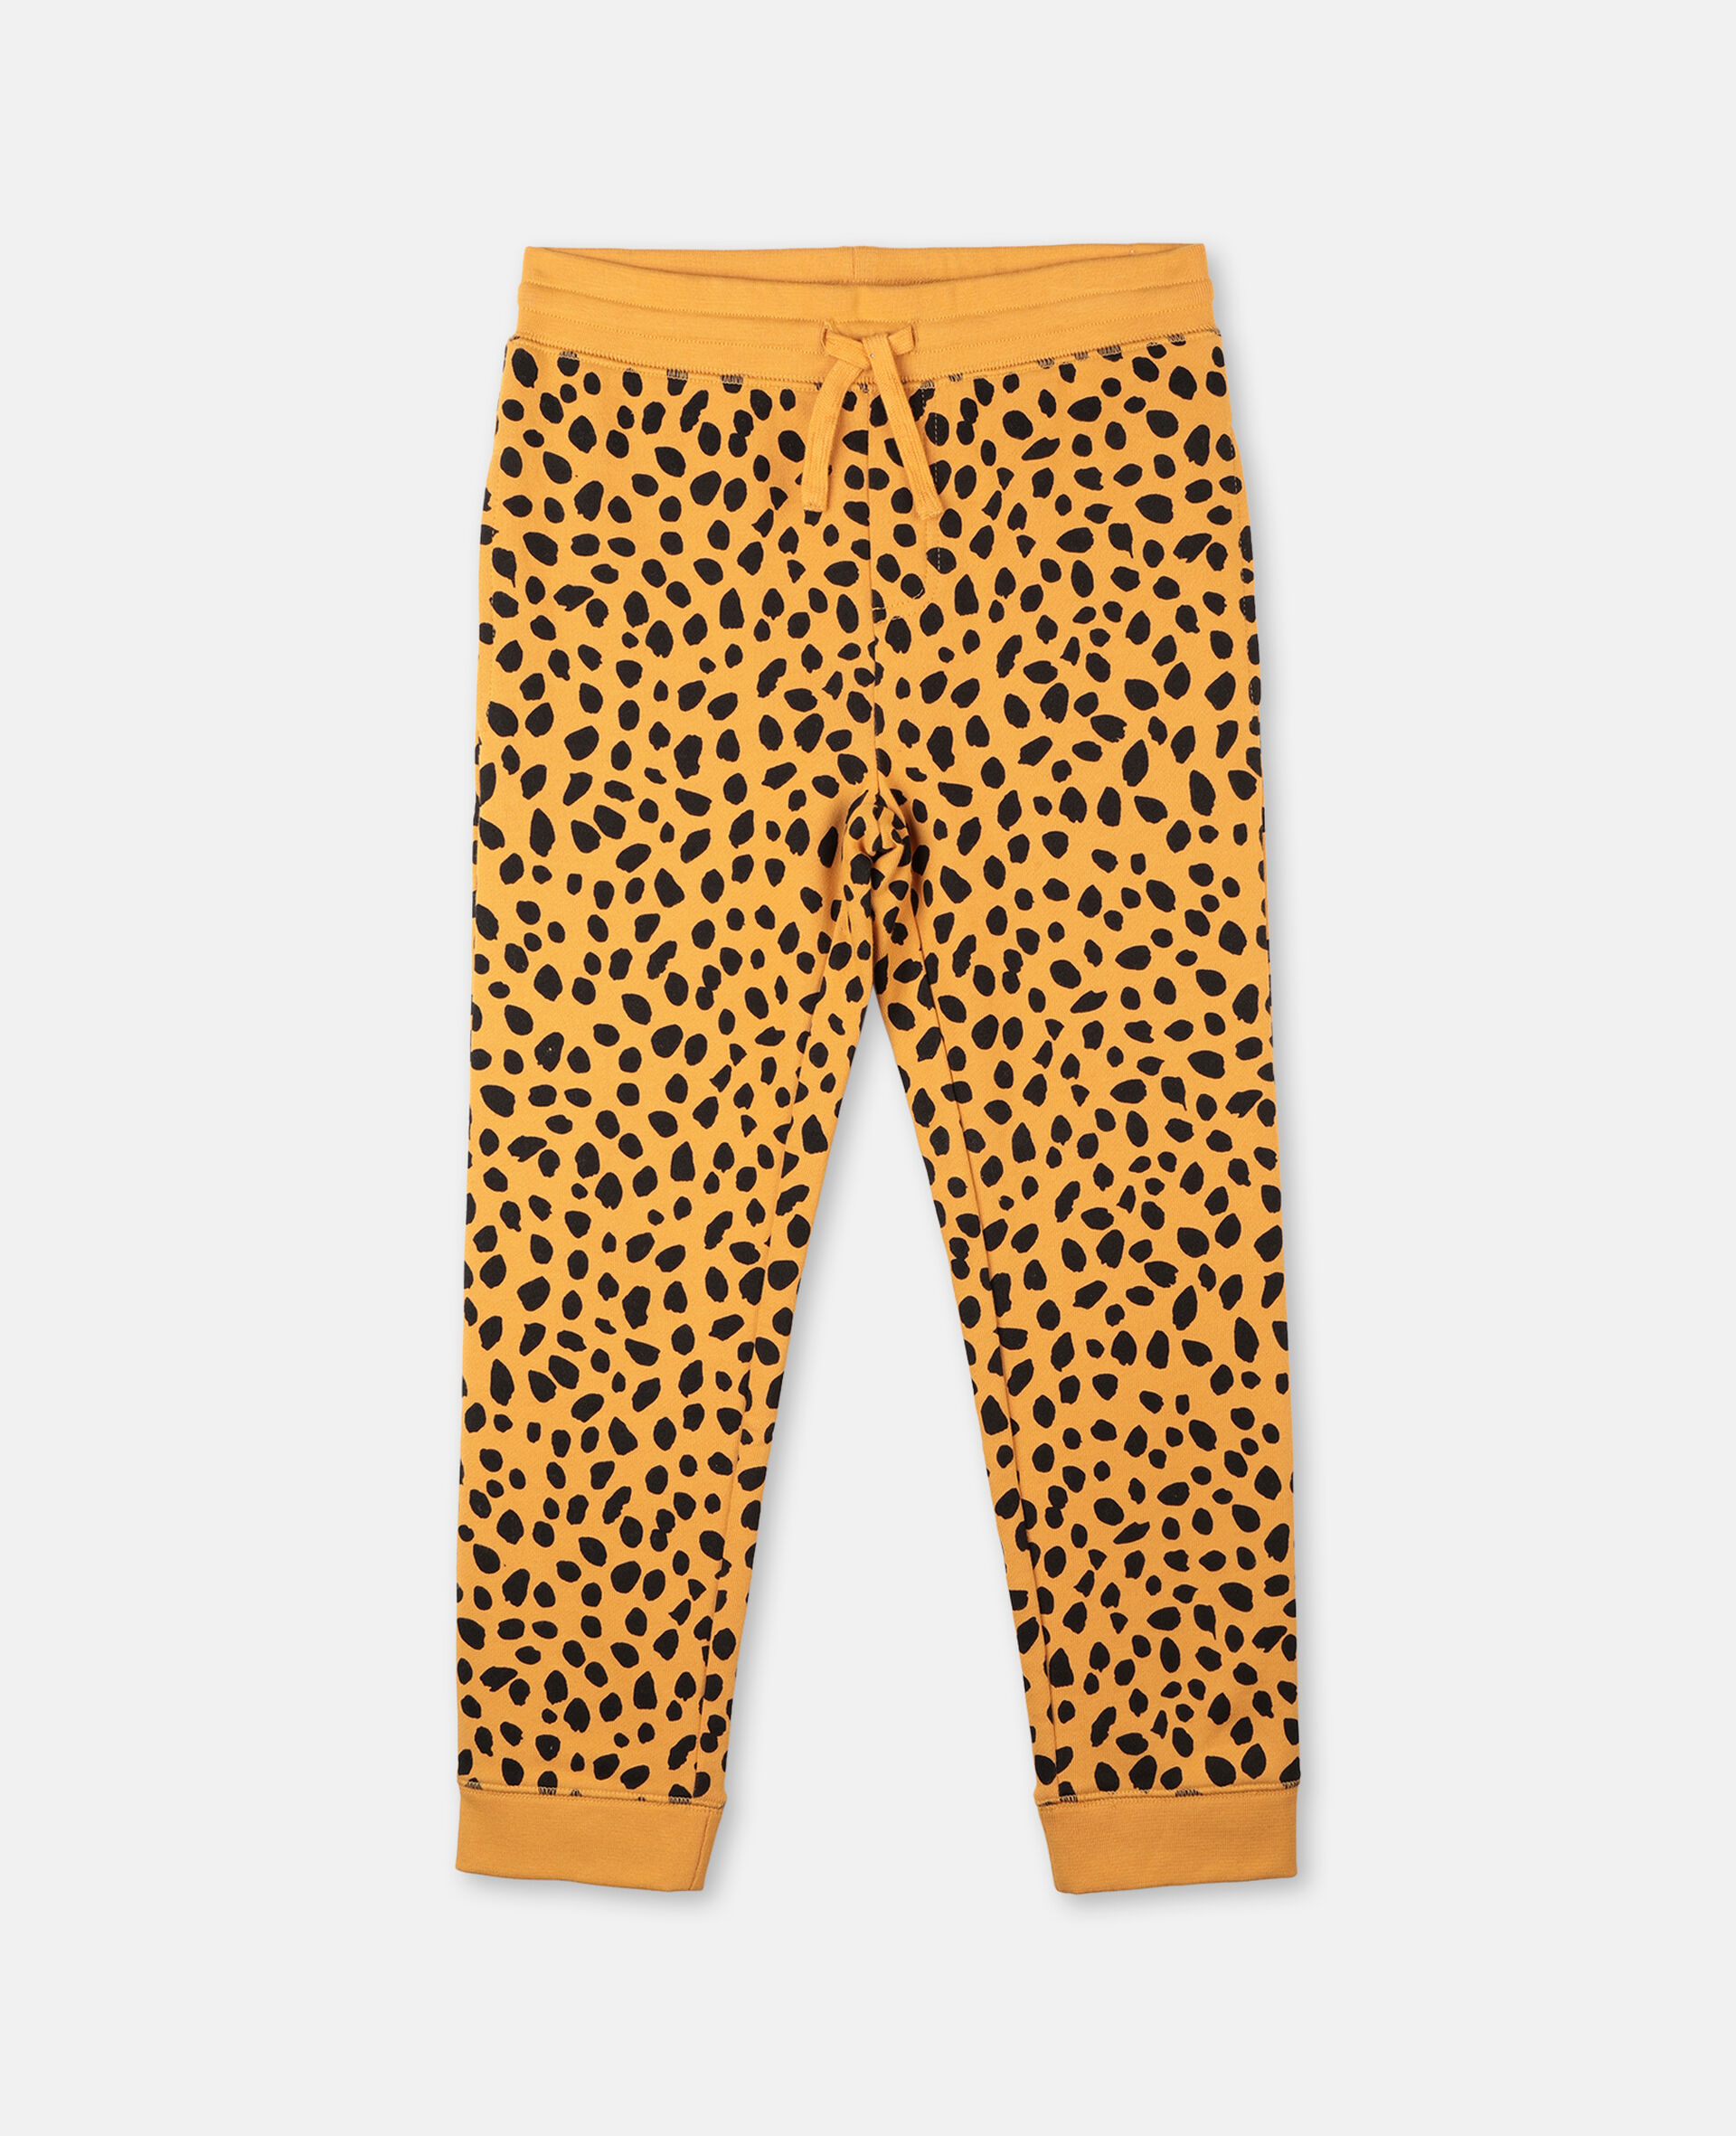 Baumwoll-Jogginghose mit Gepardenpunkte-Print  -Bunt-large image number 0